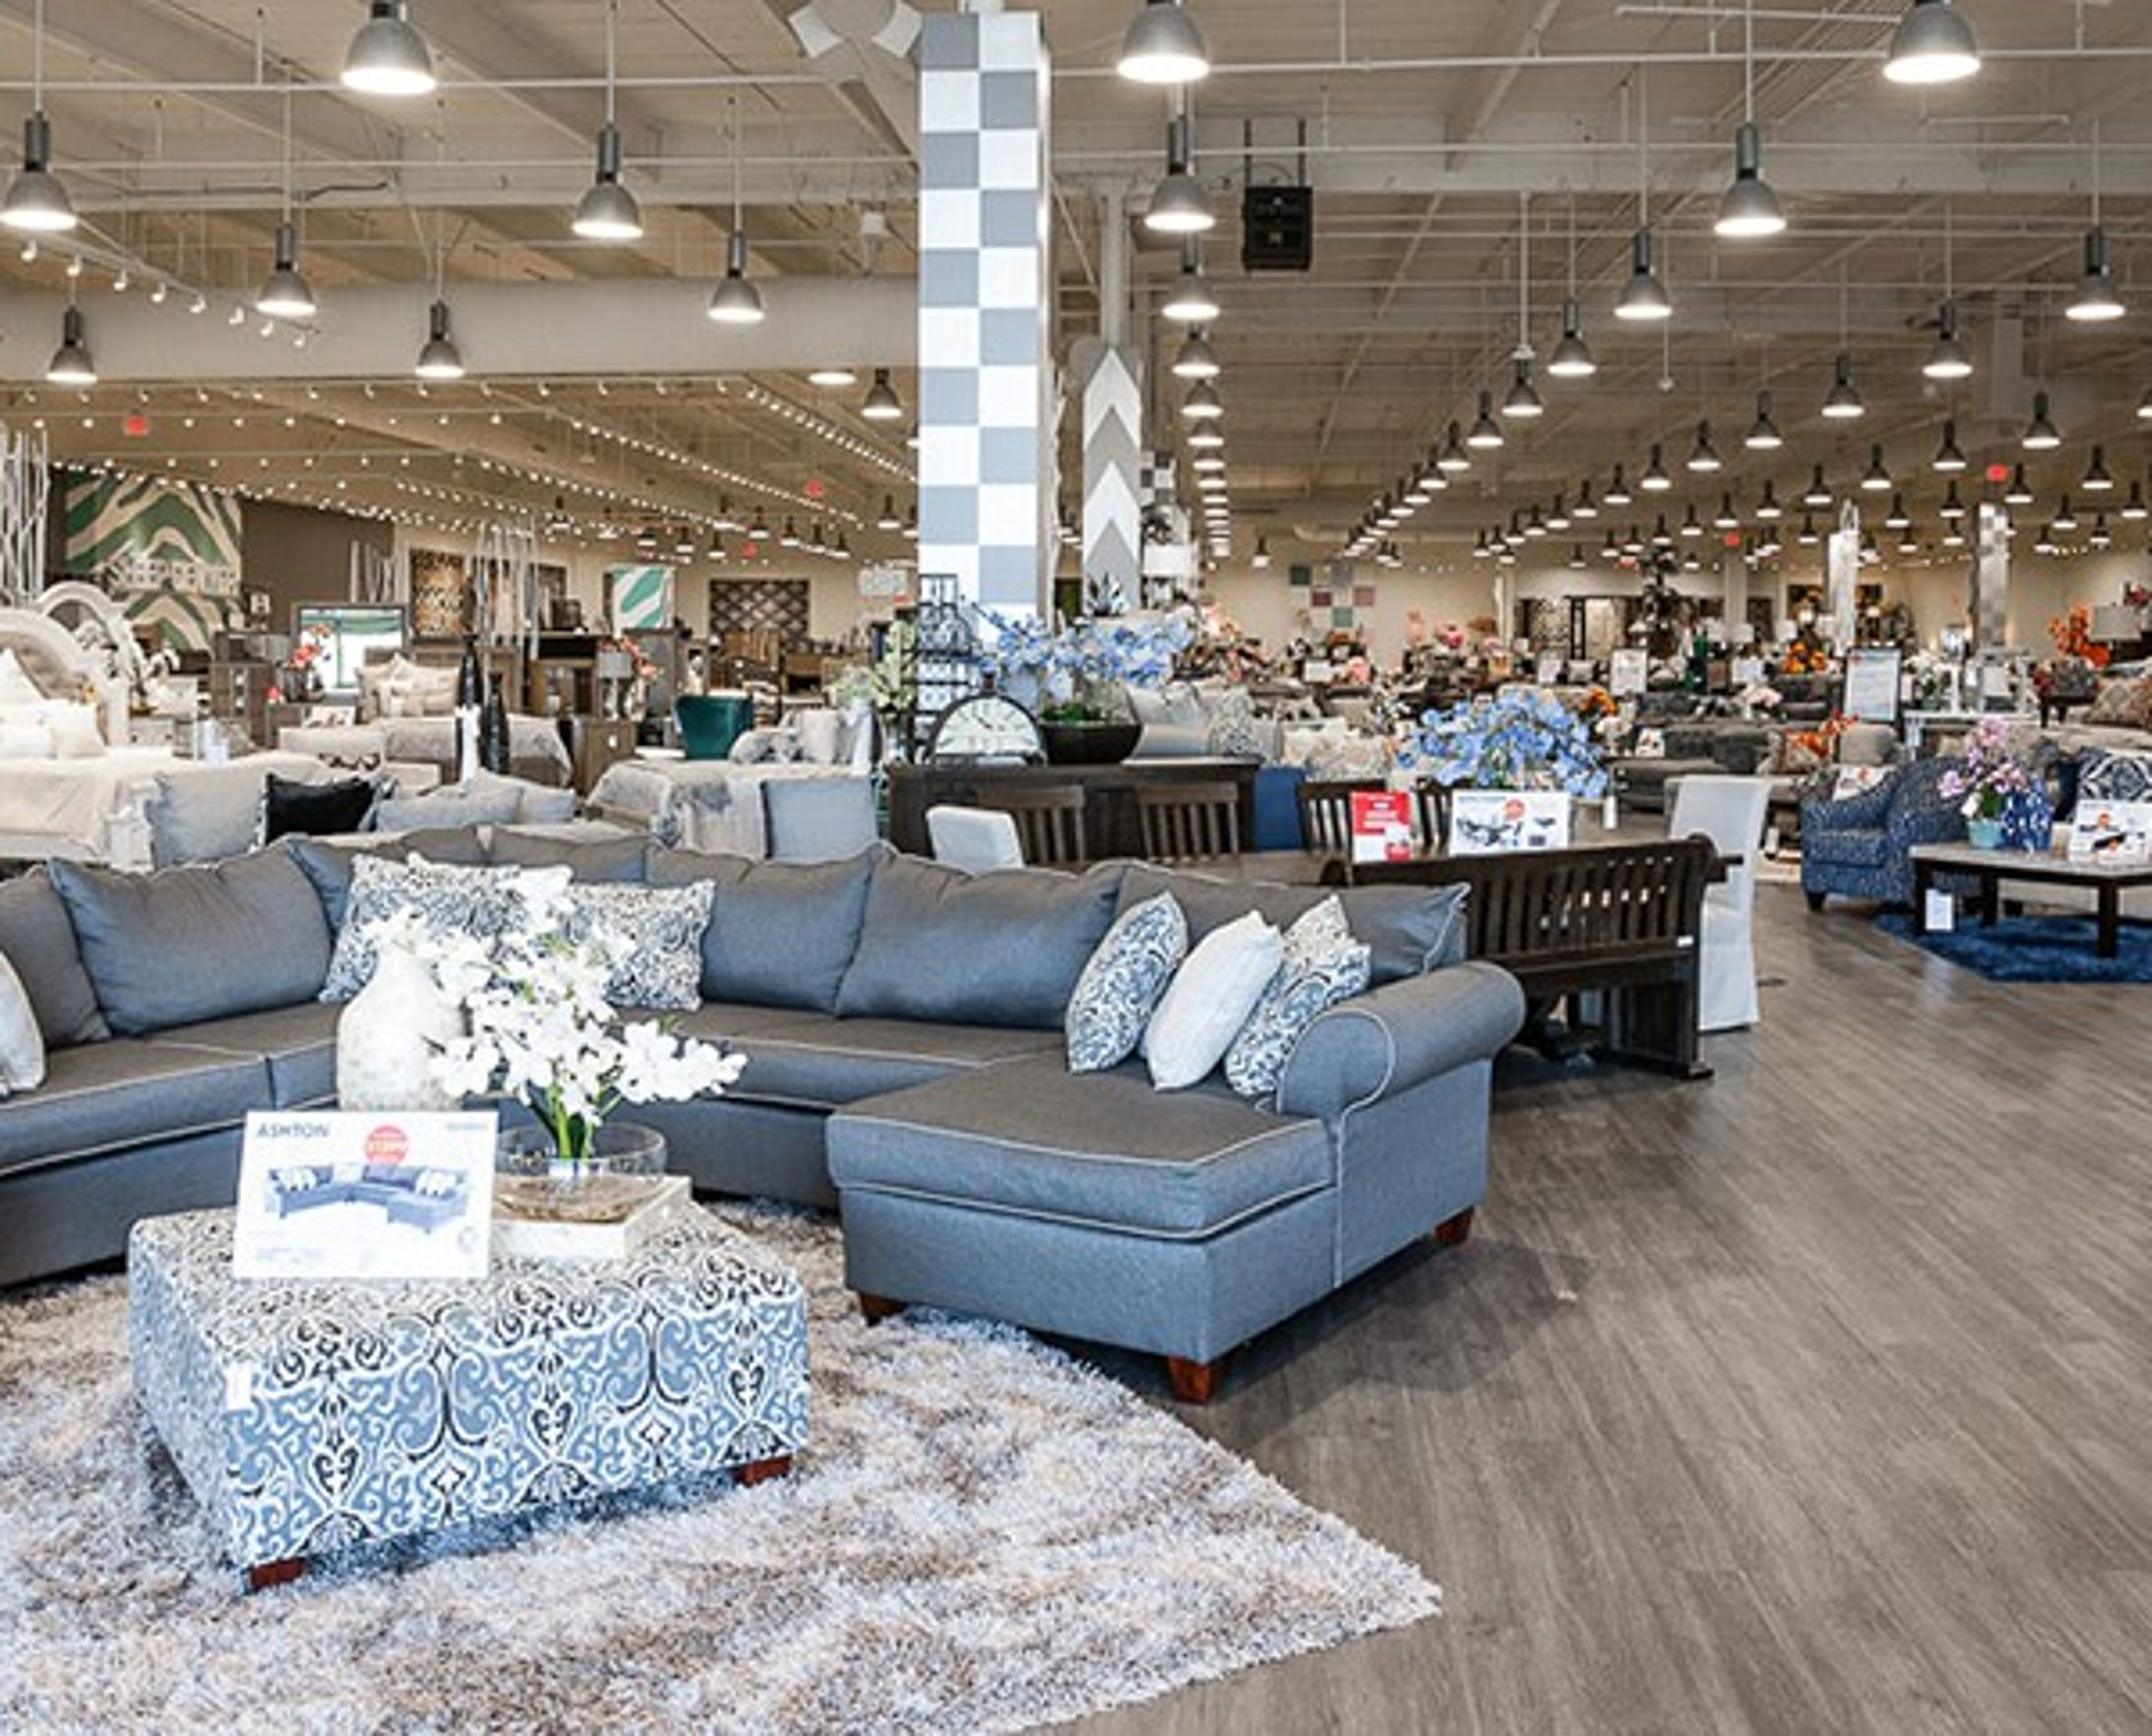 Bob's Discount Furniture and Mattress Store.